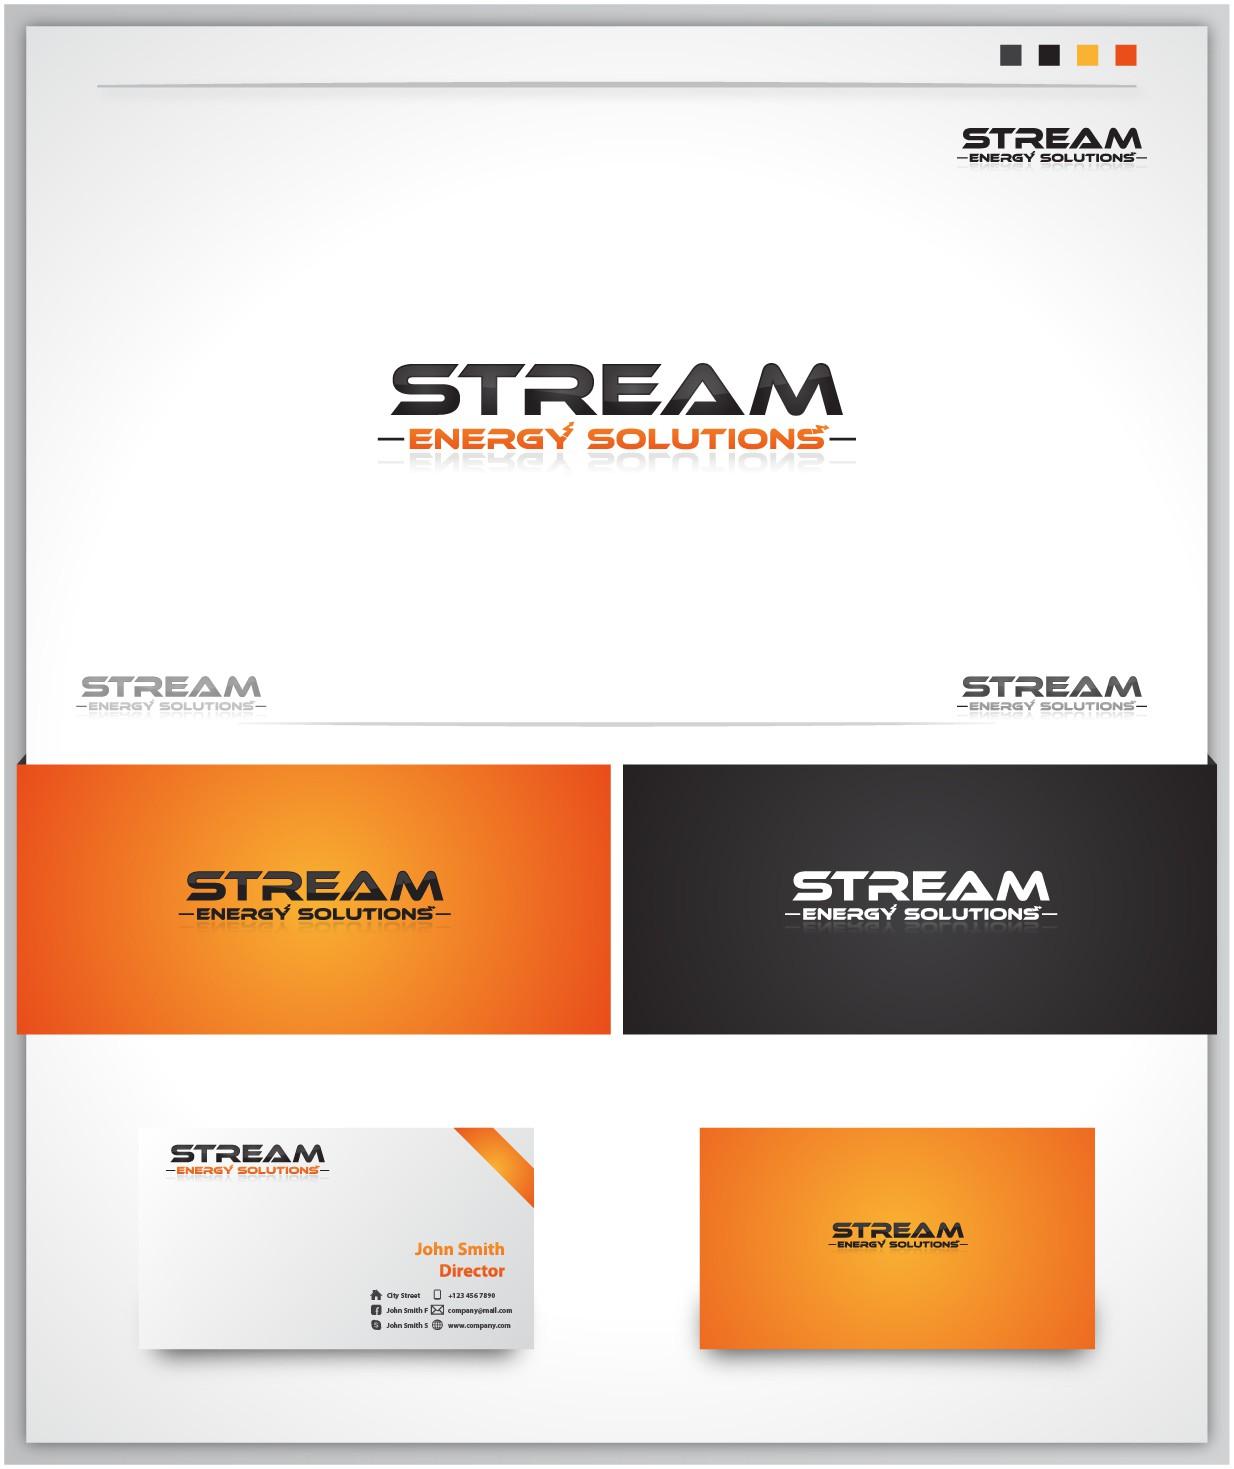 Create the next logo for STREAM energy